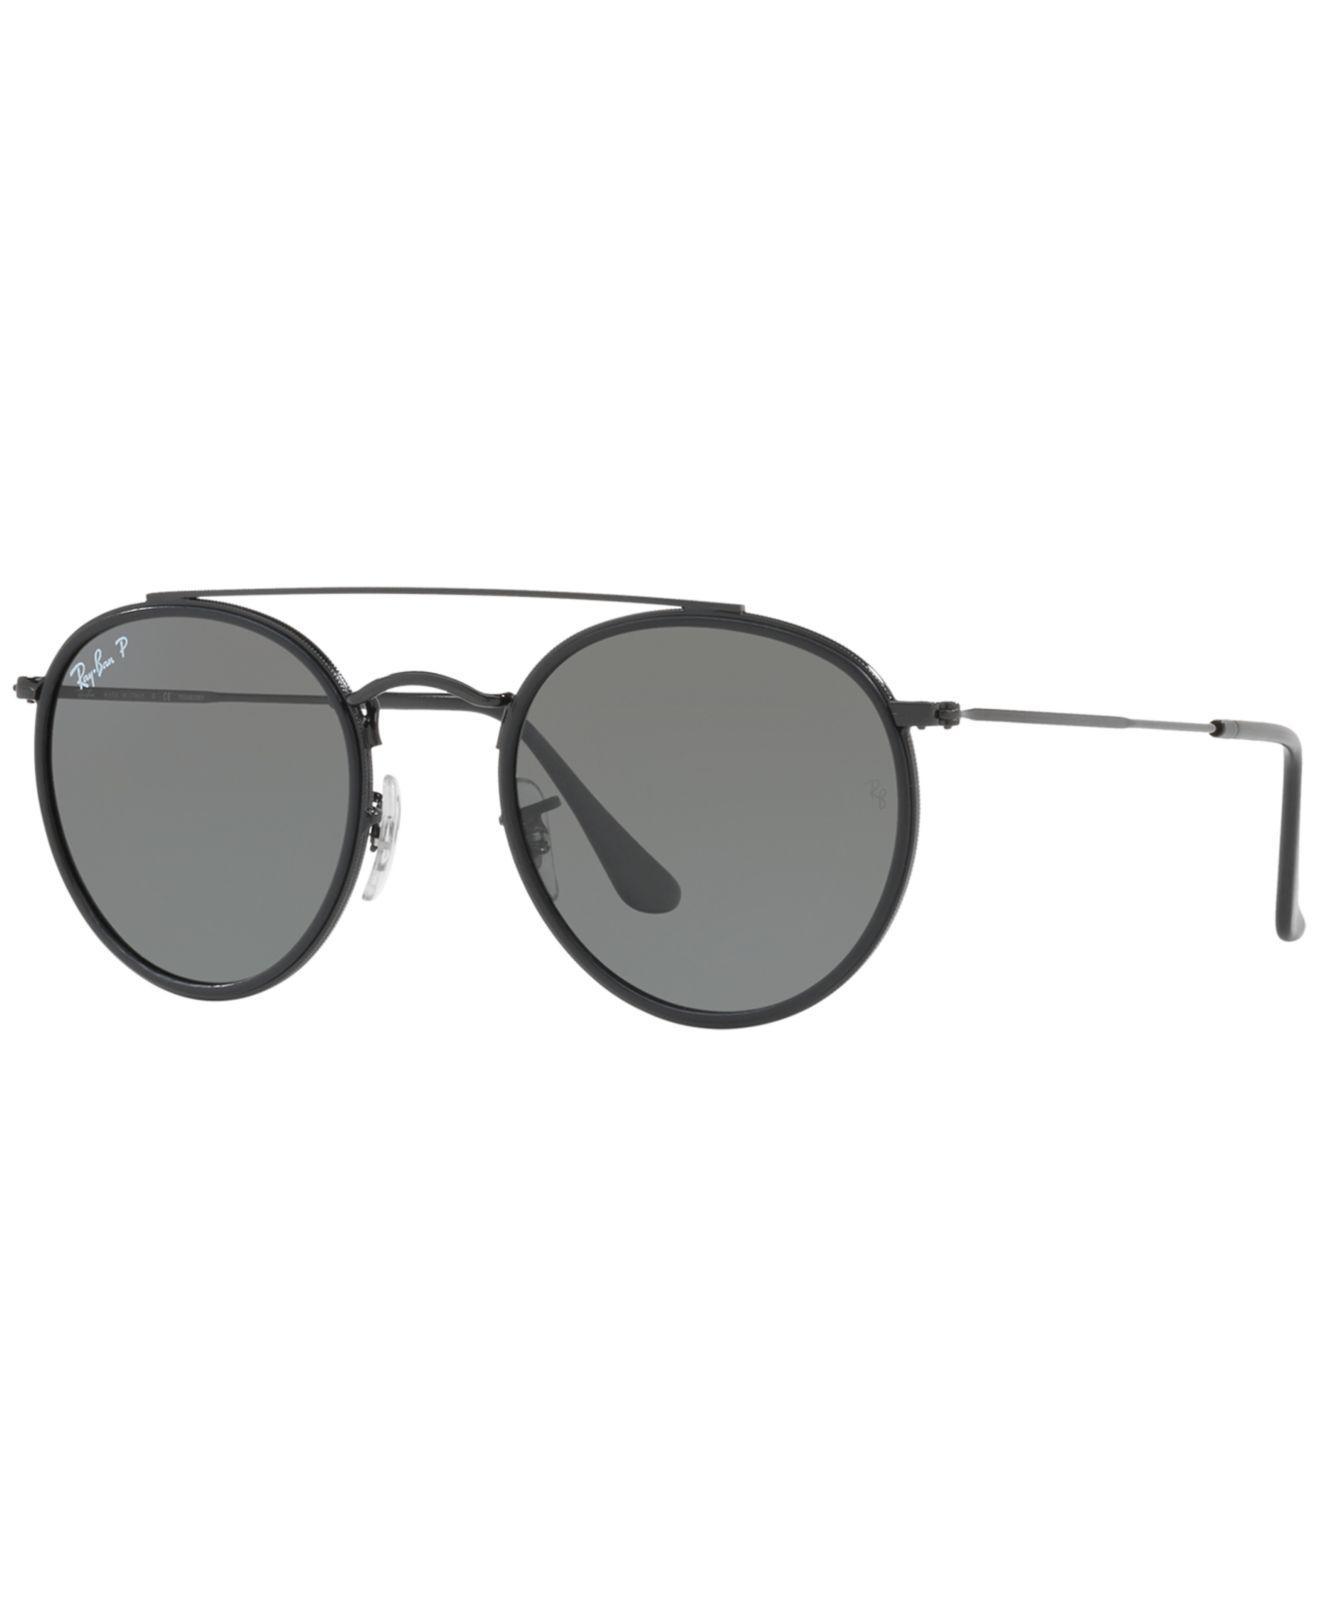 c636a21e64c80 ... coupon ray ban. womens black polarized flat lens sunglasses 383b6 1b138